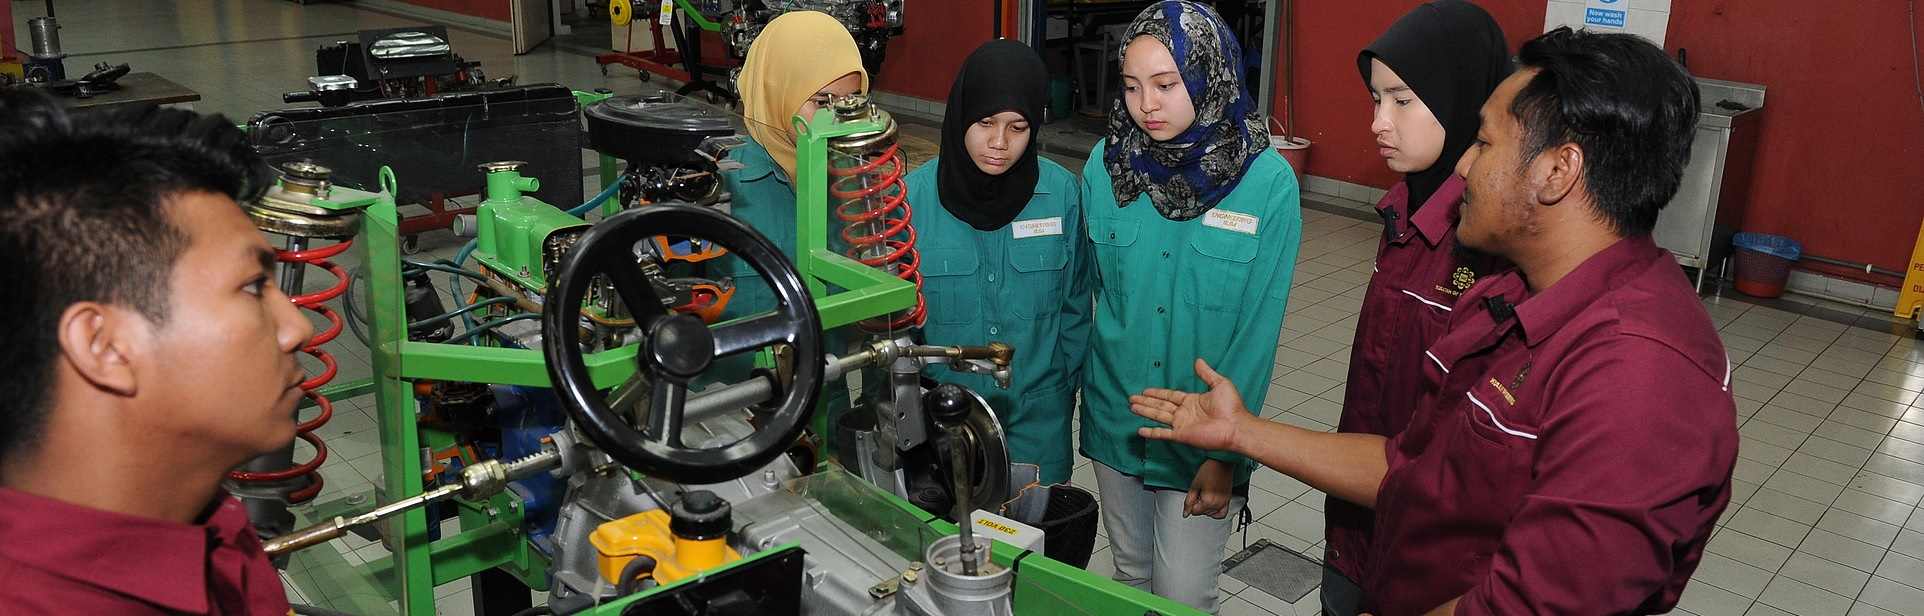 Bachelor of Engineering (Mechanical-Automotive) (Honours)